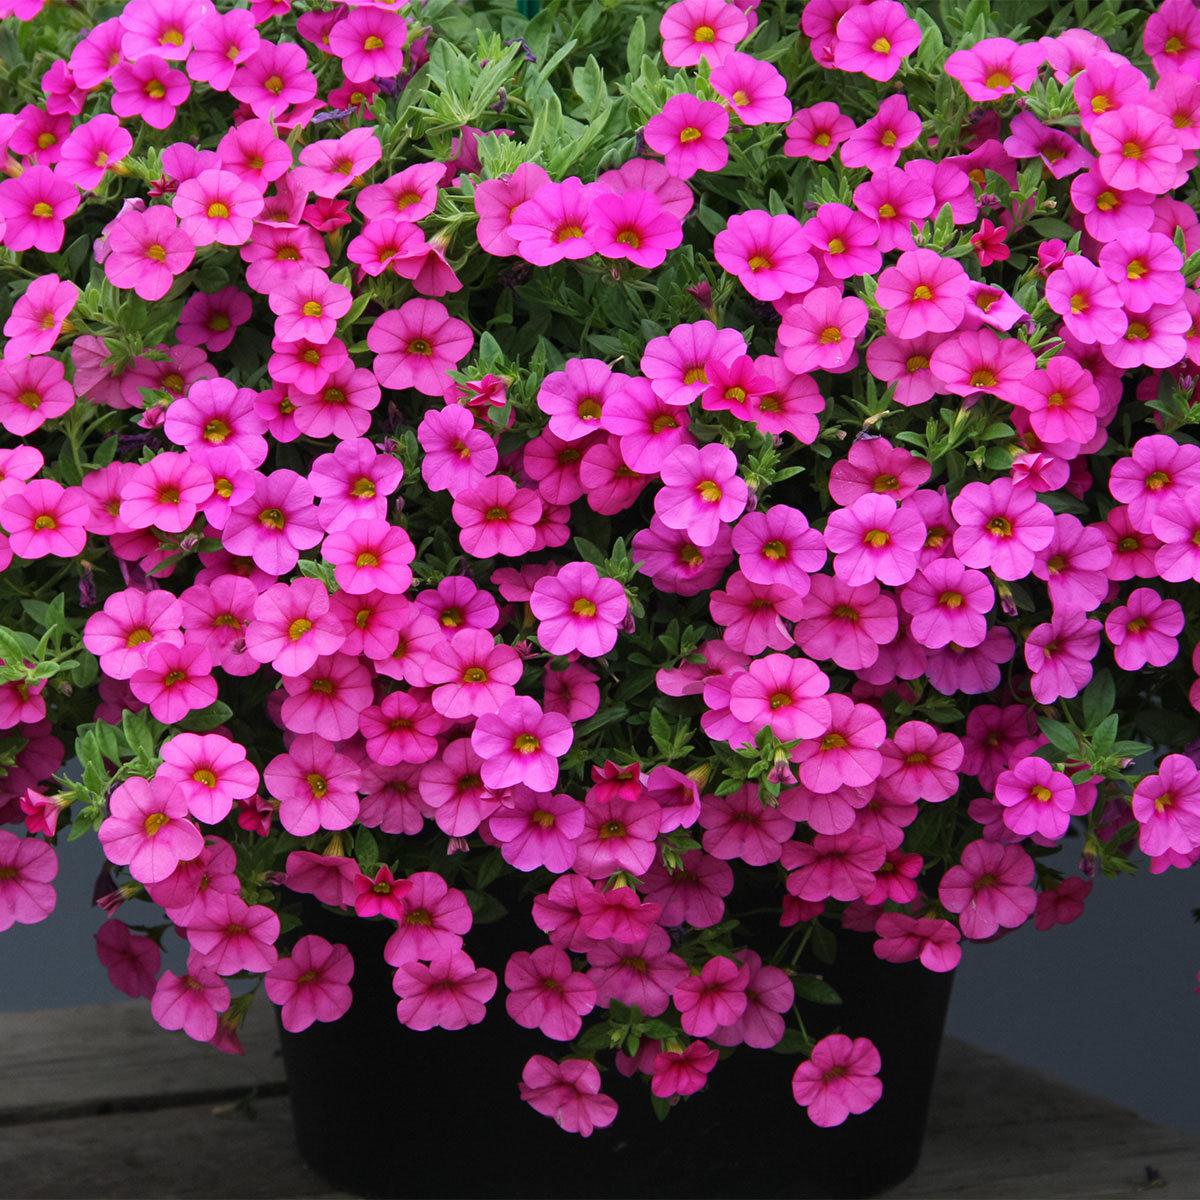 Calibrachoa-Petuniensamen Kabloom Deep Pink F1, Pillensaat | #2